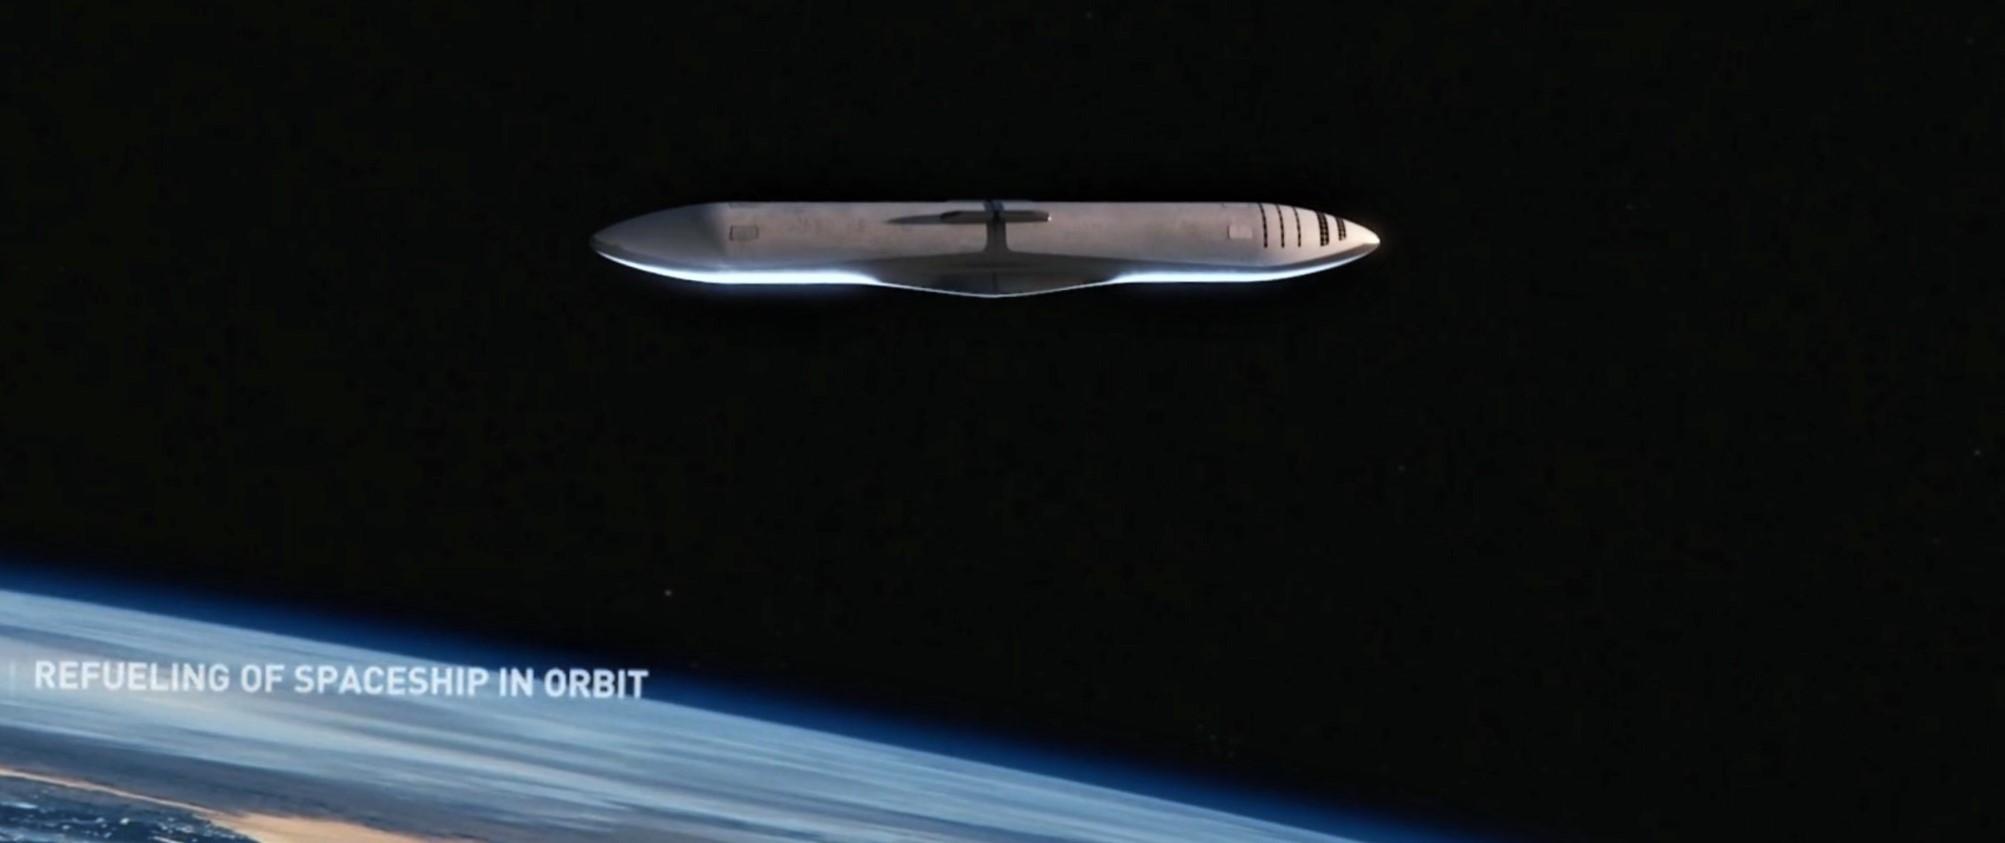 BFR refueling on orbit 2 (SpaceX)